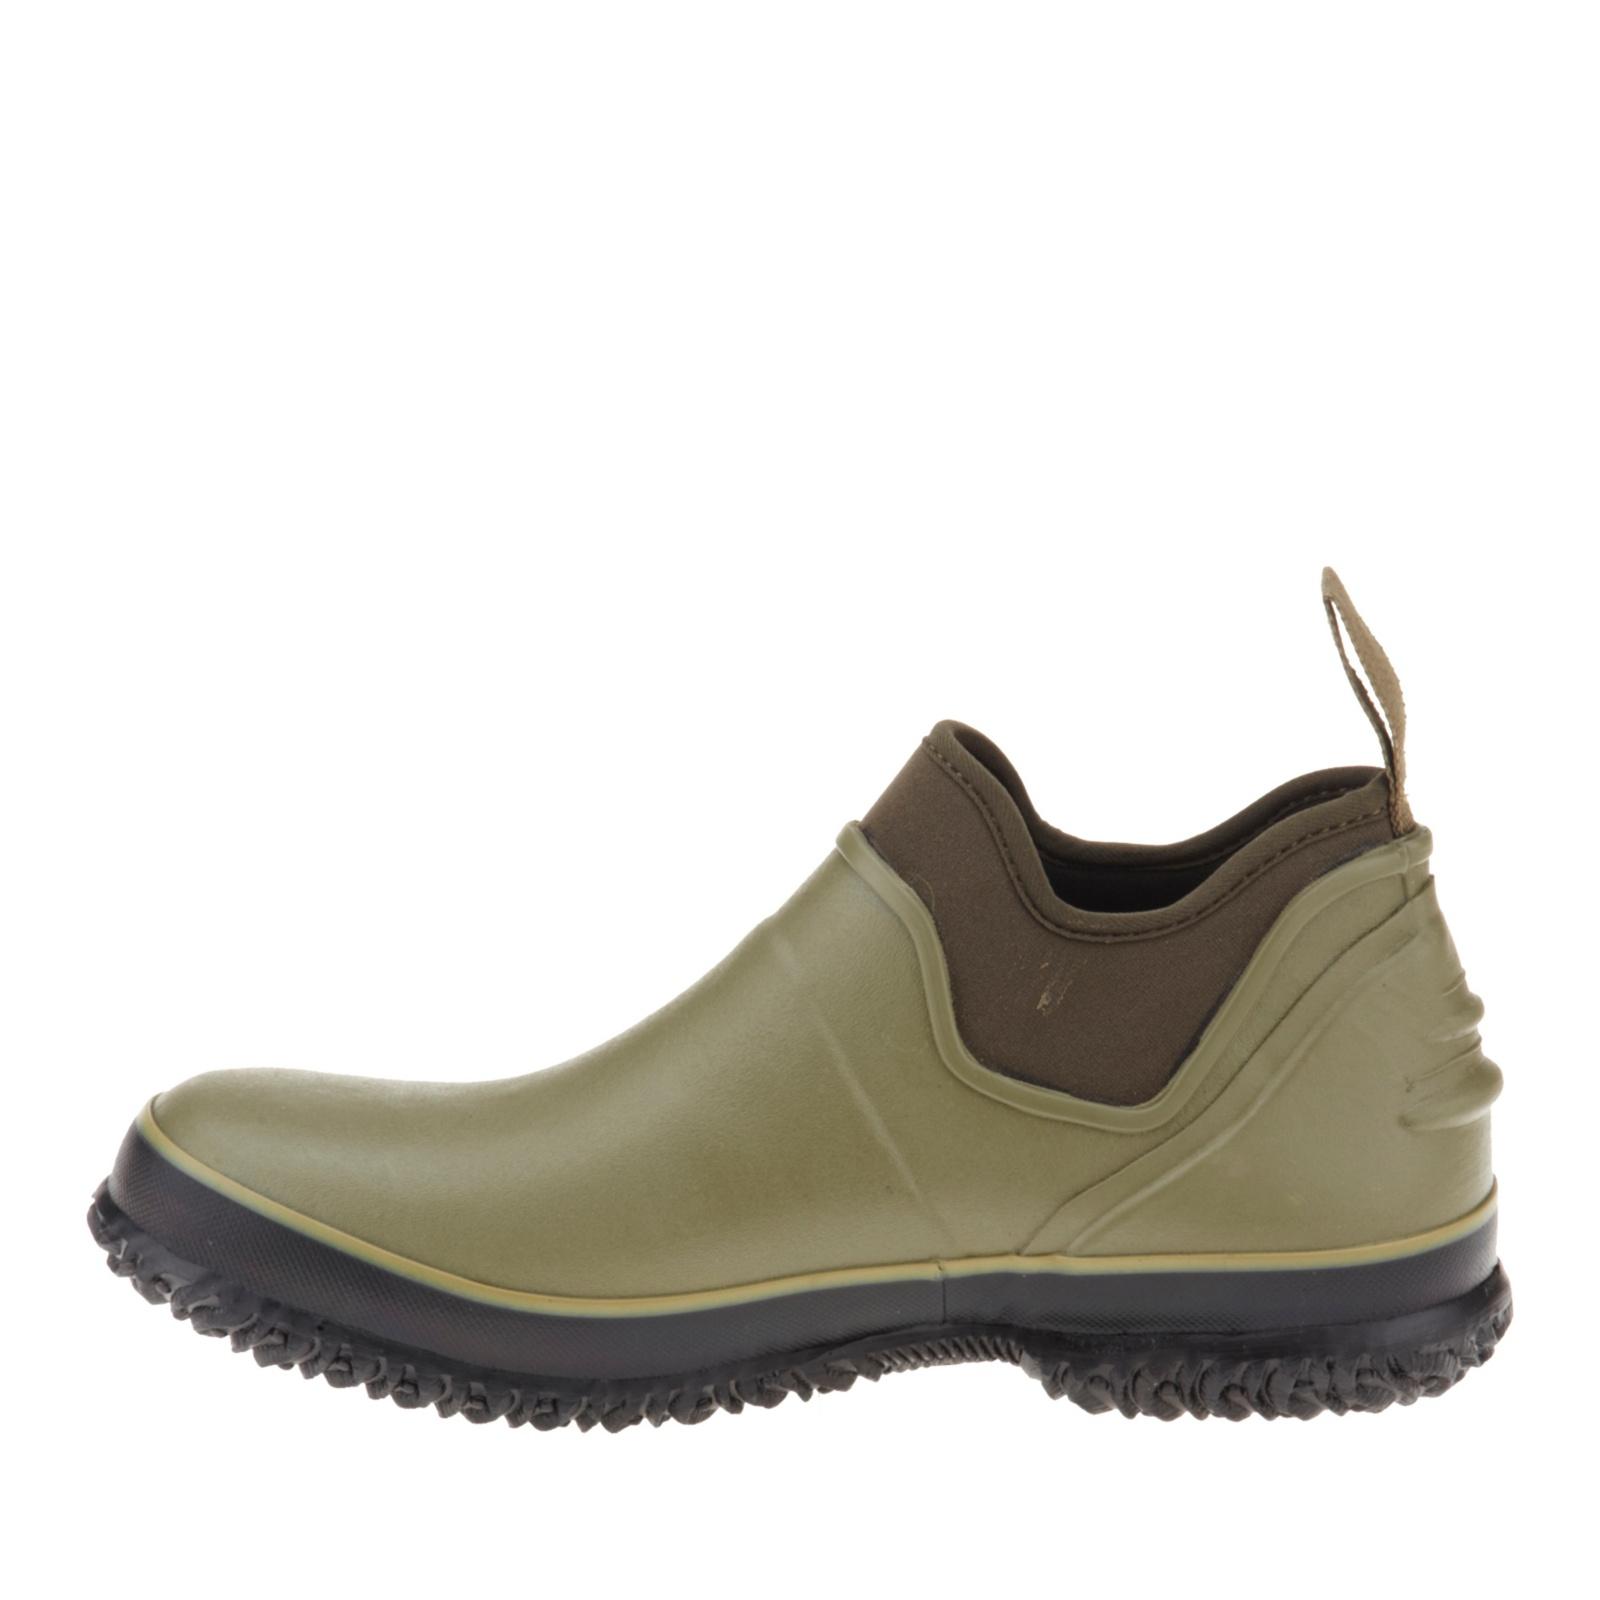 bogs farmer outdoor slip on shoes ebay